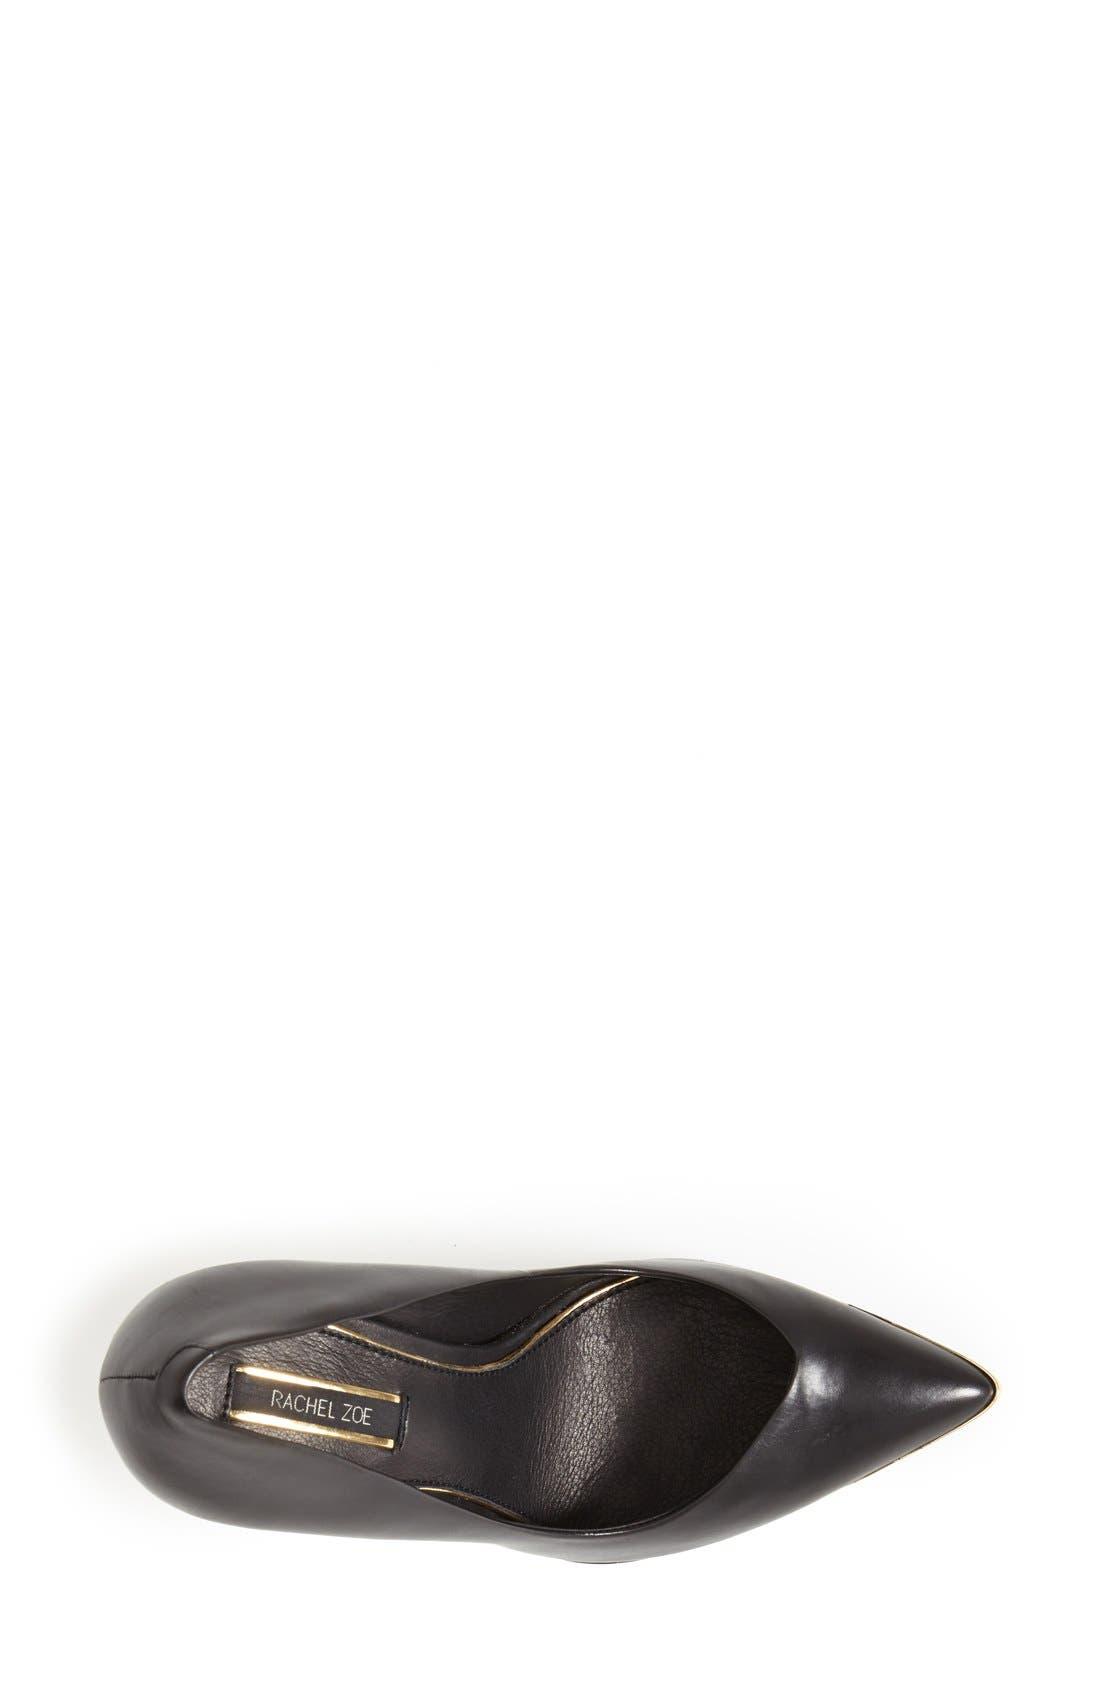 Alternate Image 3  - Rachel Zoe 'Carina' Leather Pointy Toe Pump (Women)